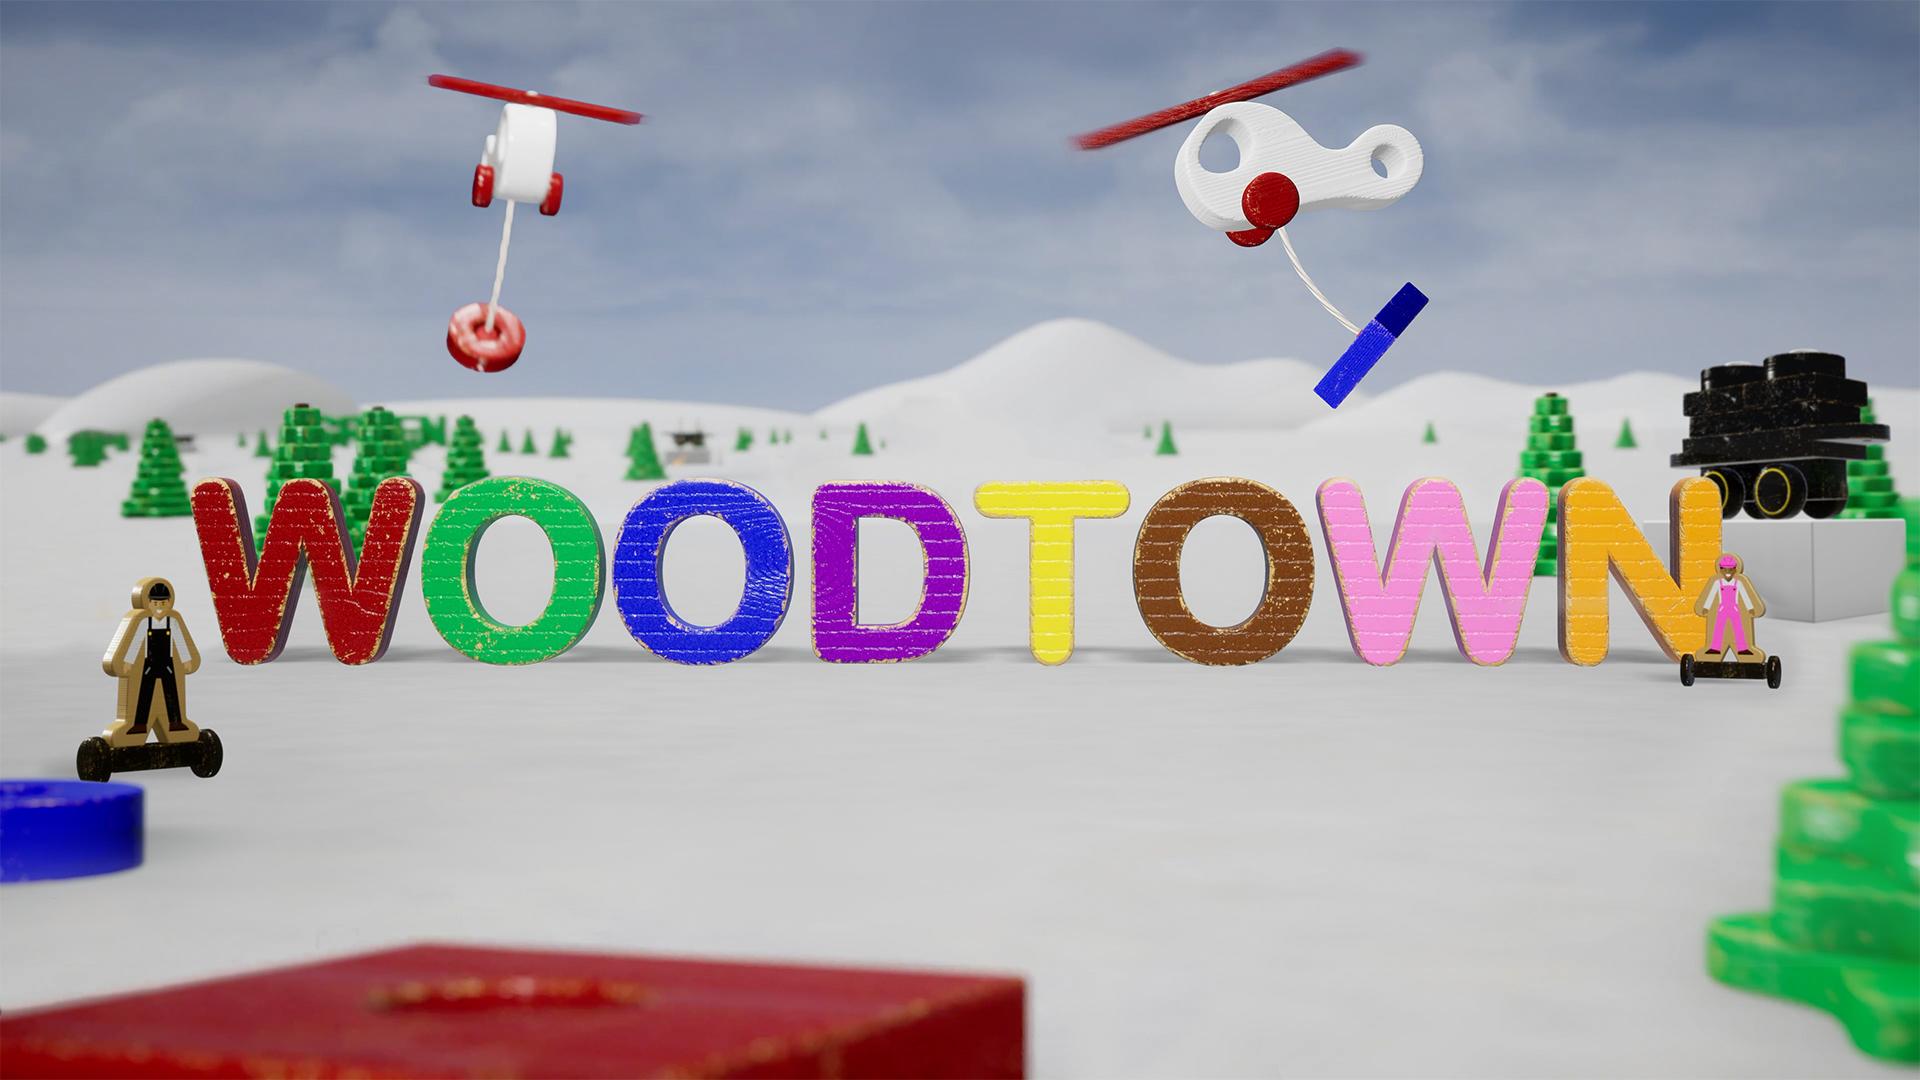 Woodtown on Amazon Prime Video UK